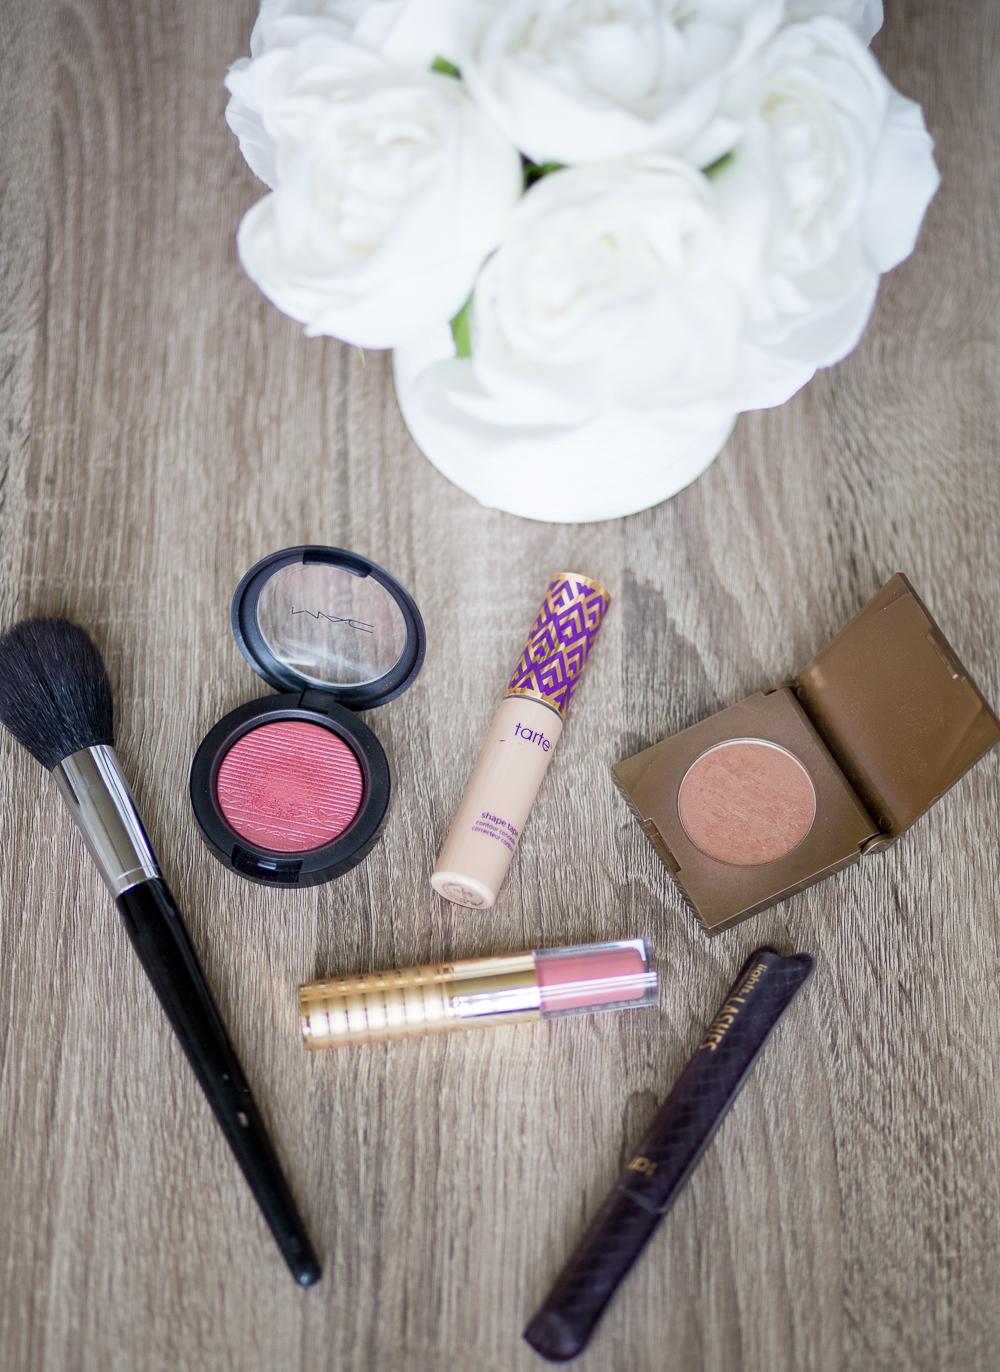 eBay Shopping For Summer Beauty Essentials